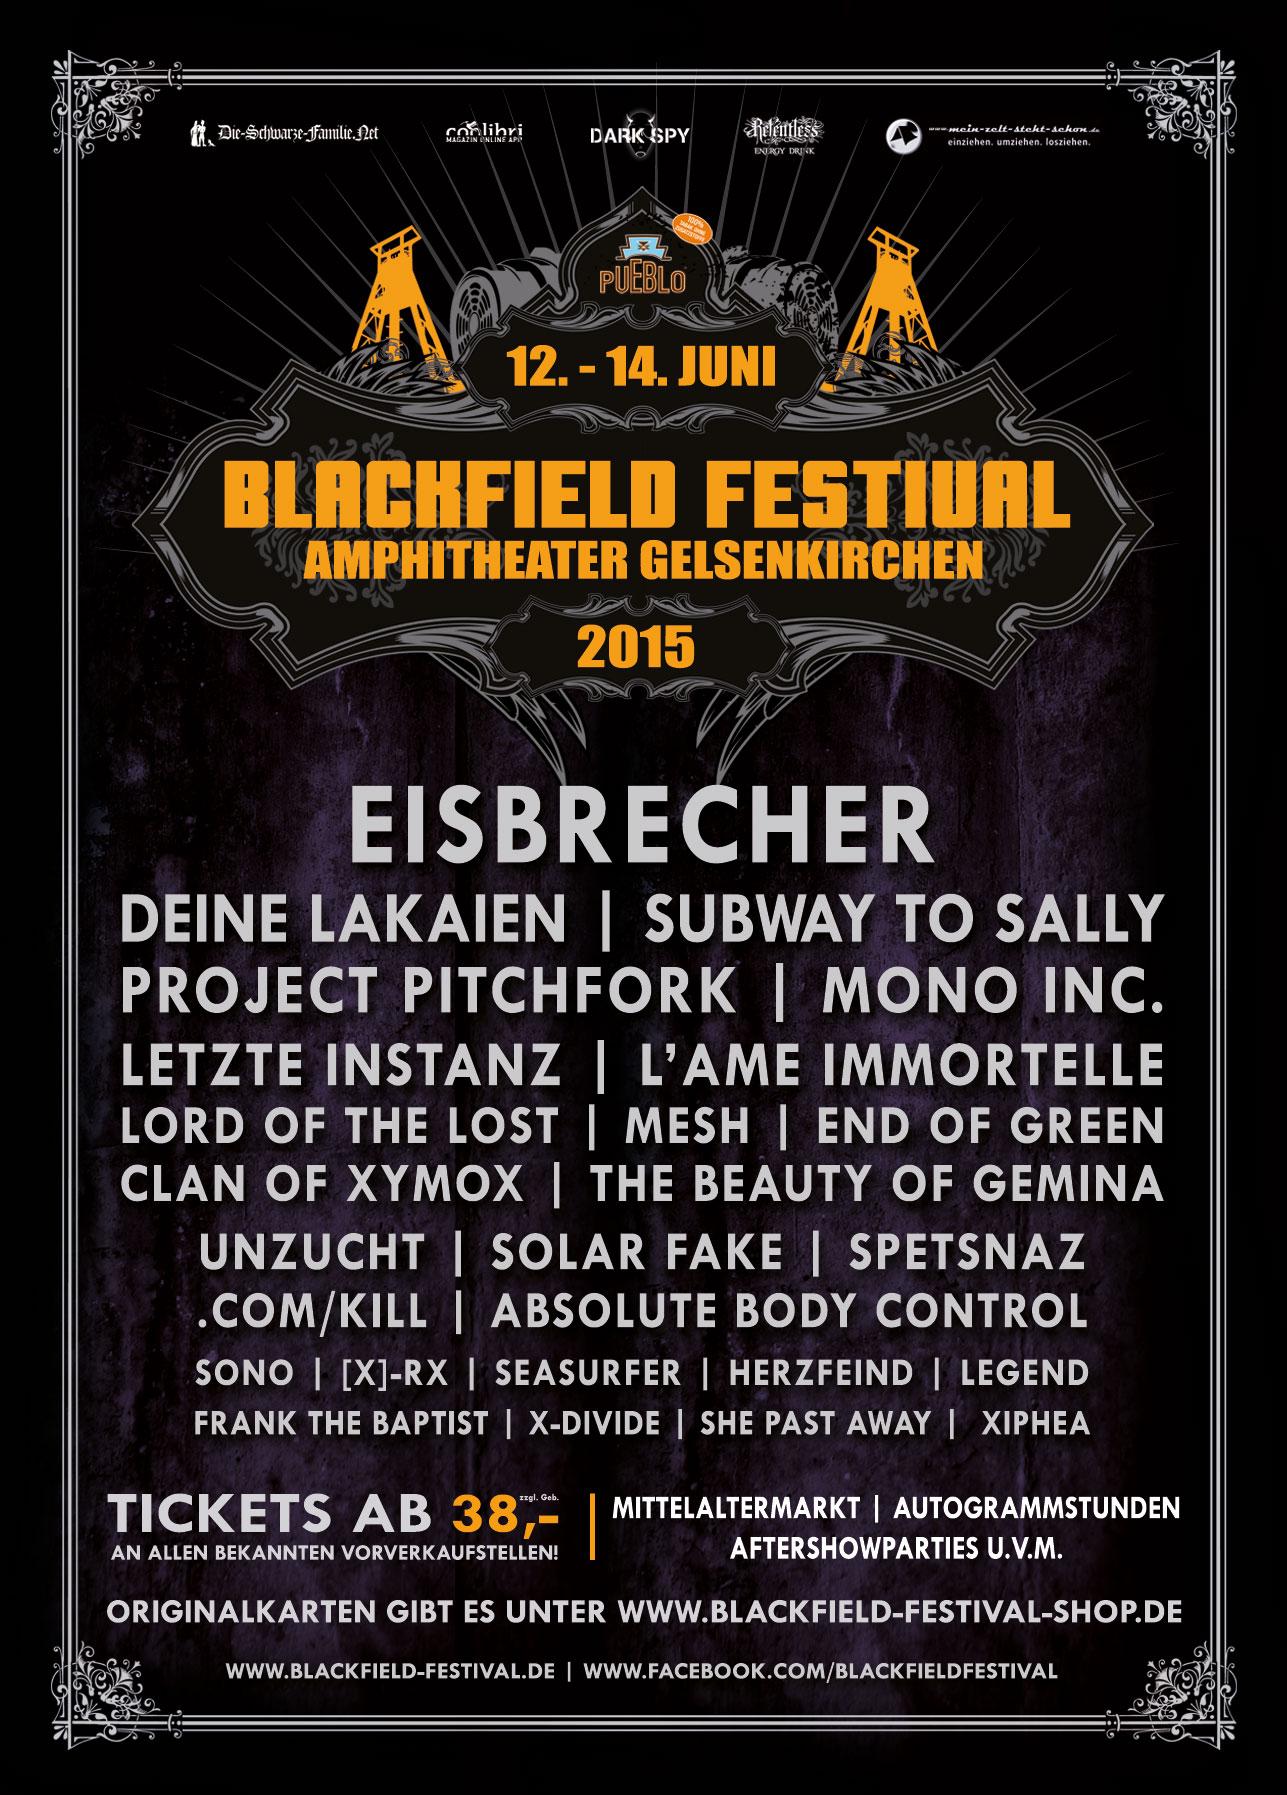 Blackfield Festival